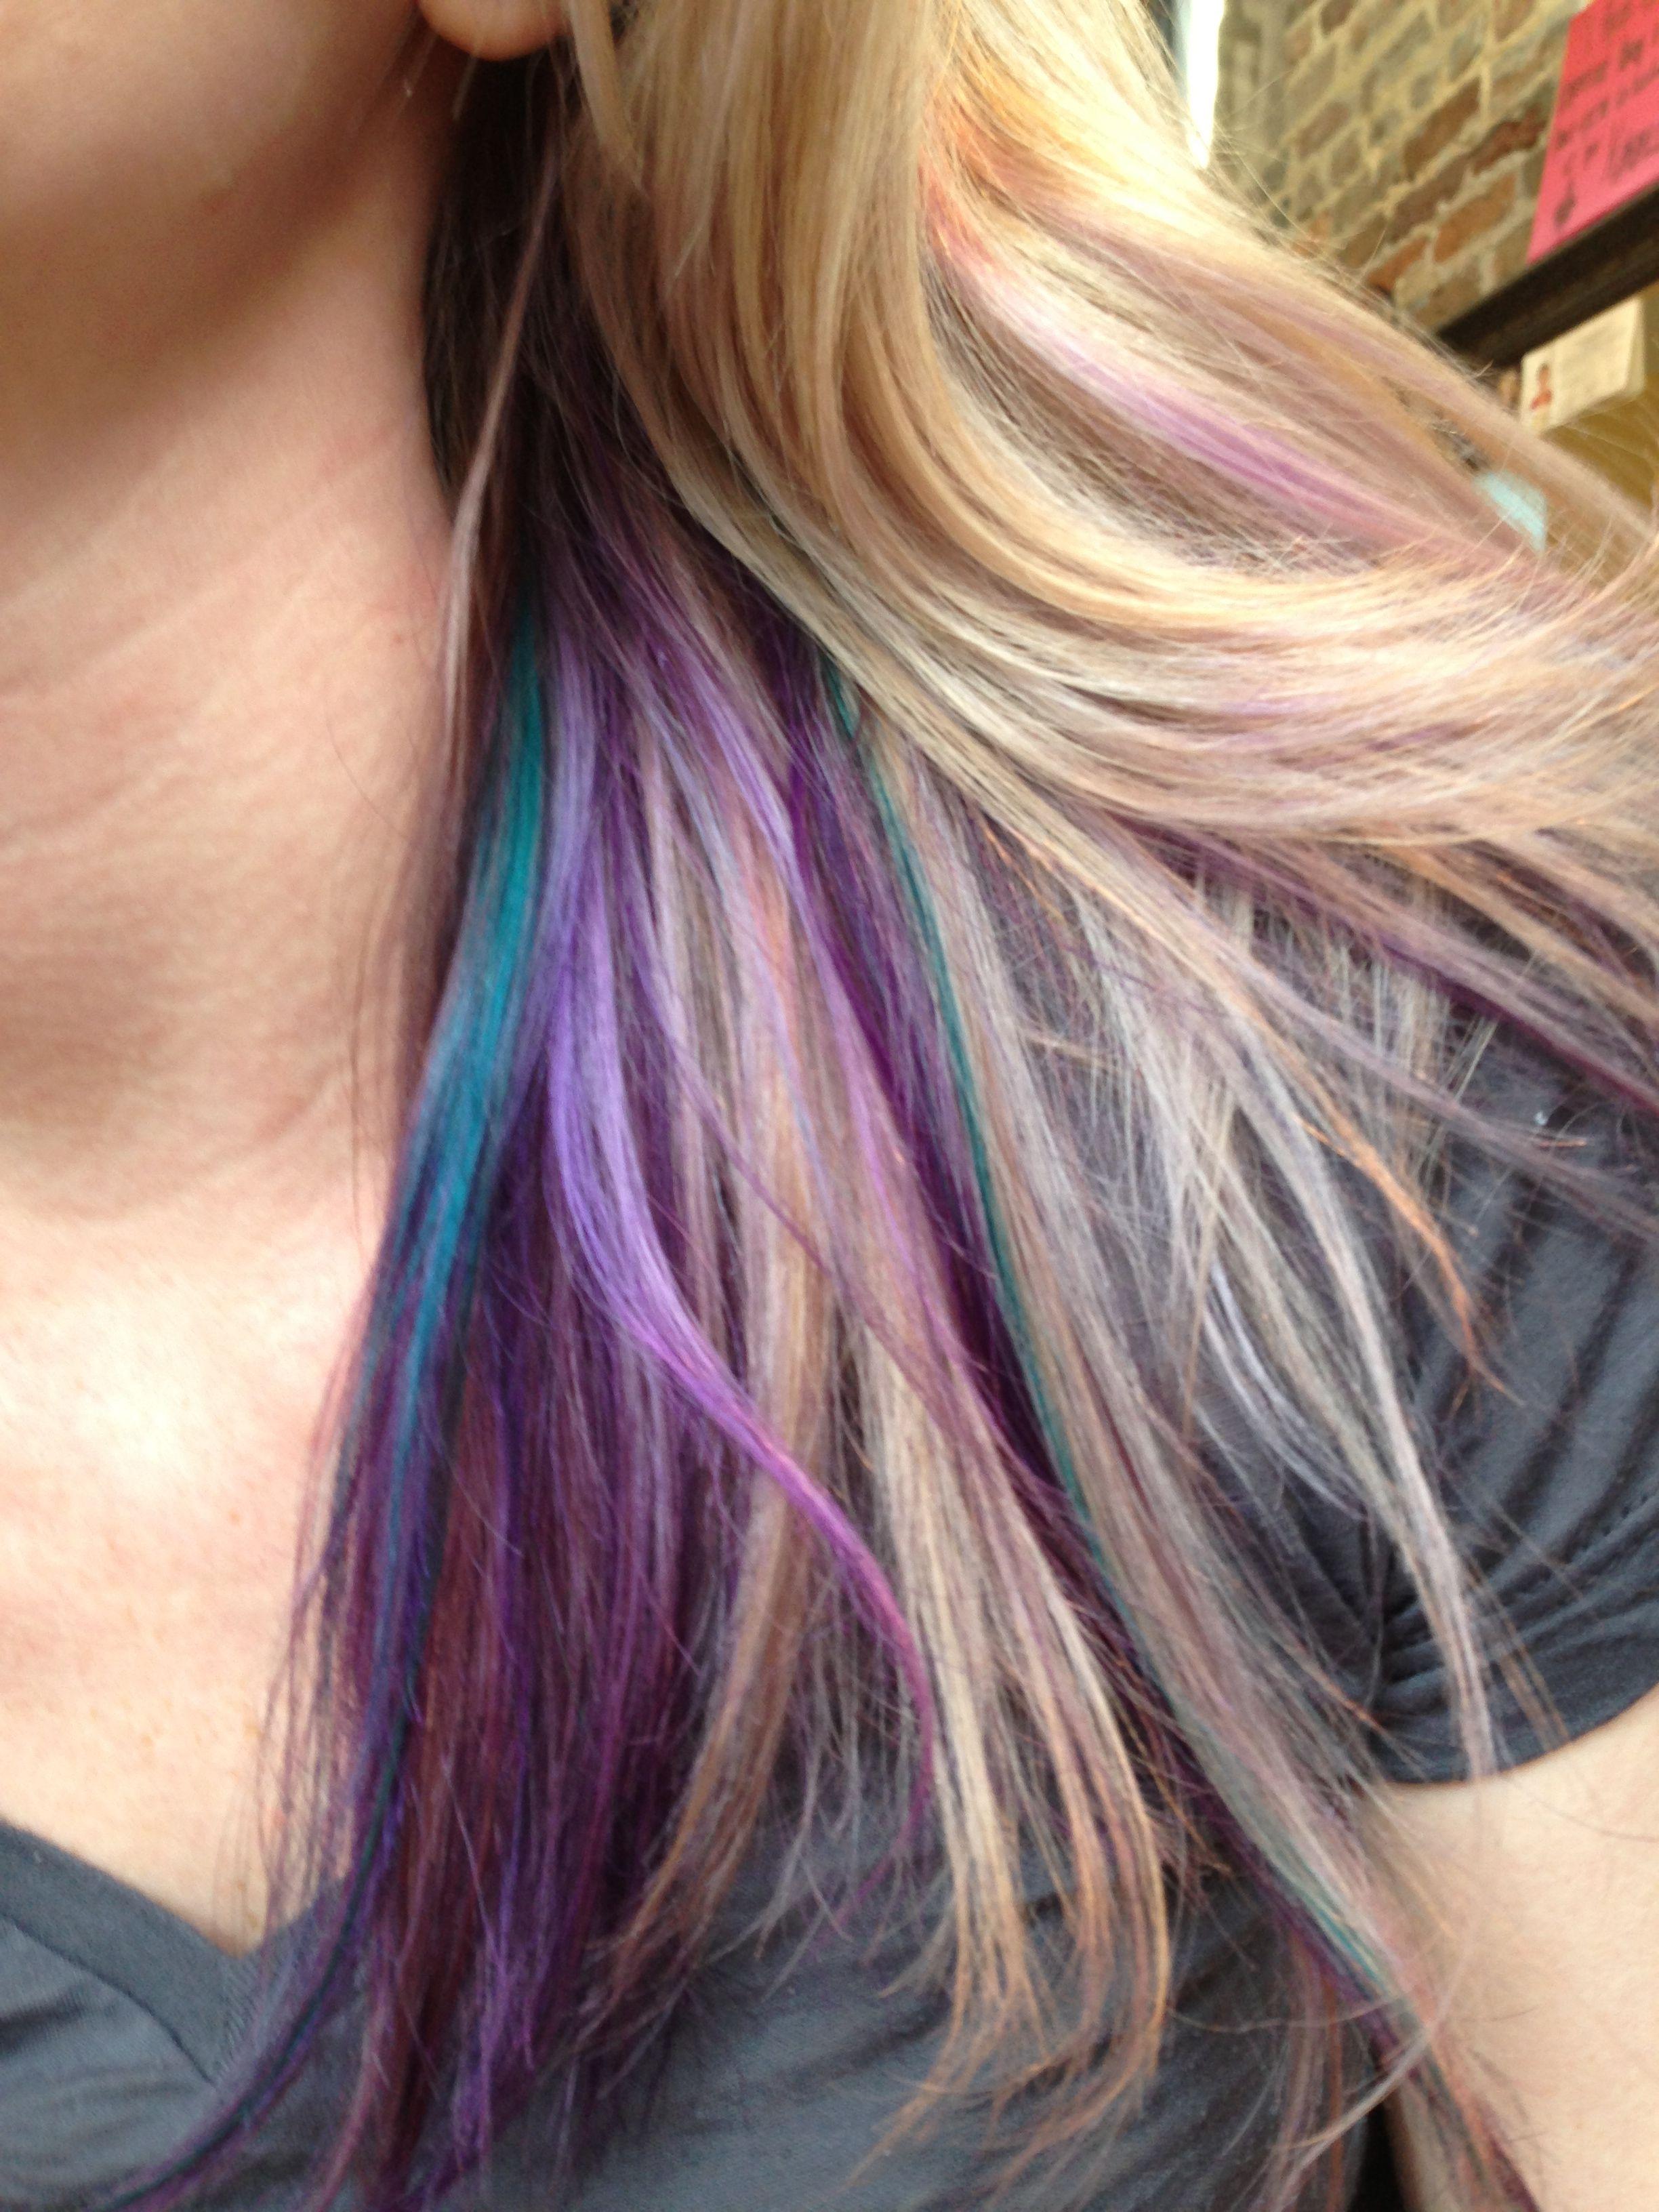 Pink Purple And Blue Teal Peekaboo Highlights Under Blonde